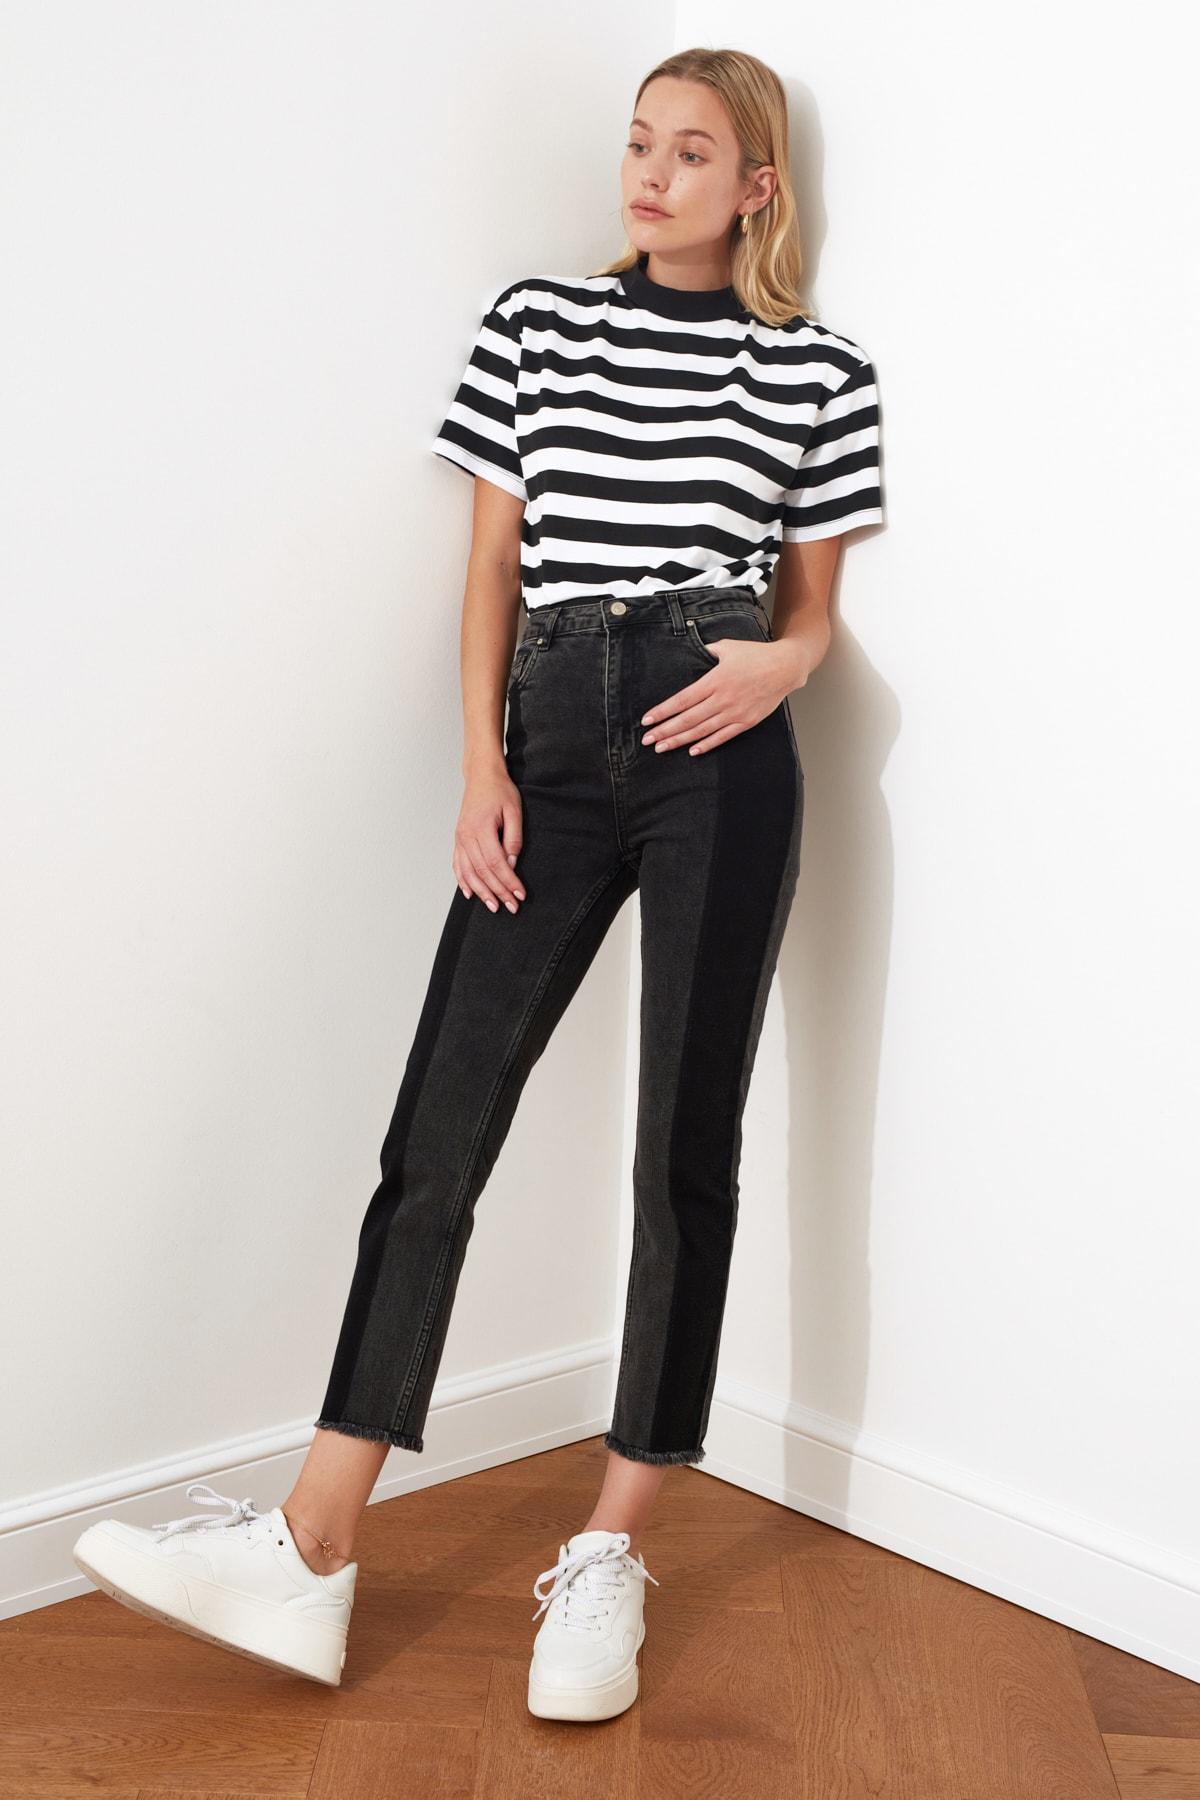 TRENDYOLMİLLA Siyah Renk Bloklu Yüksek Bel Slim Fit Jeans TWOAW21JE0017 1